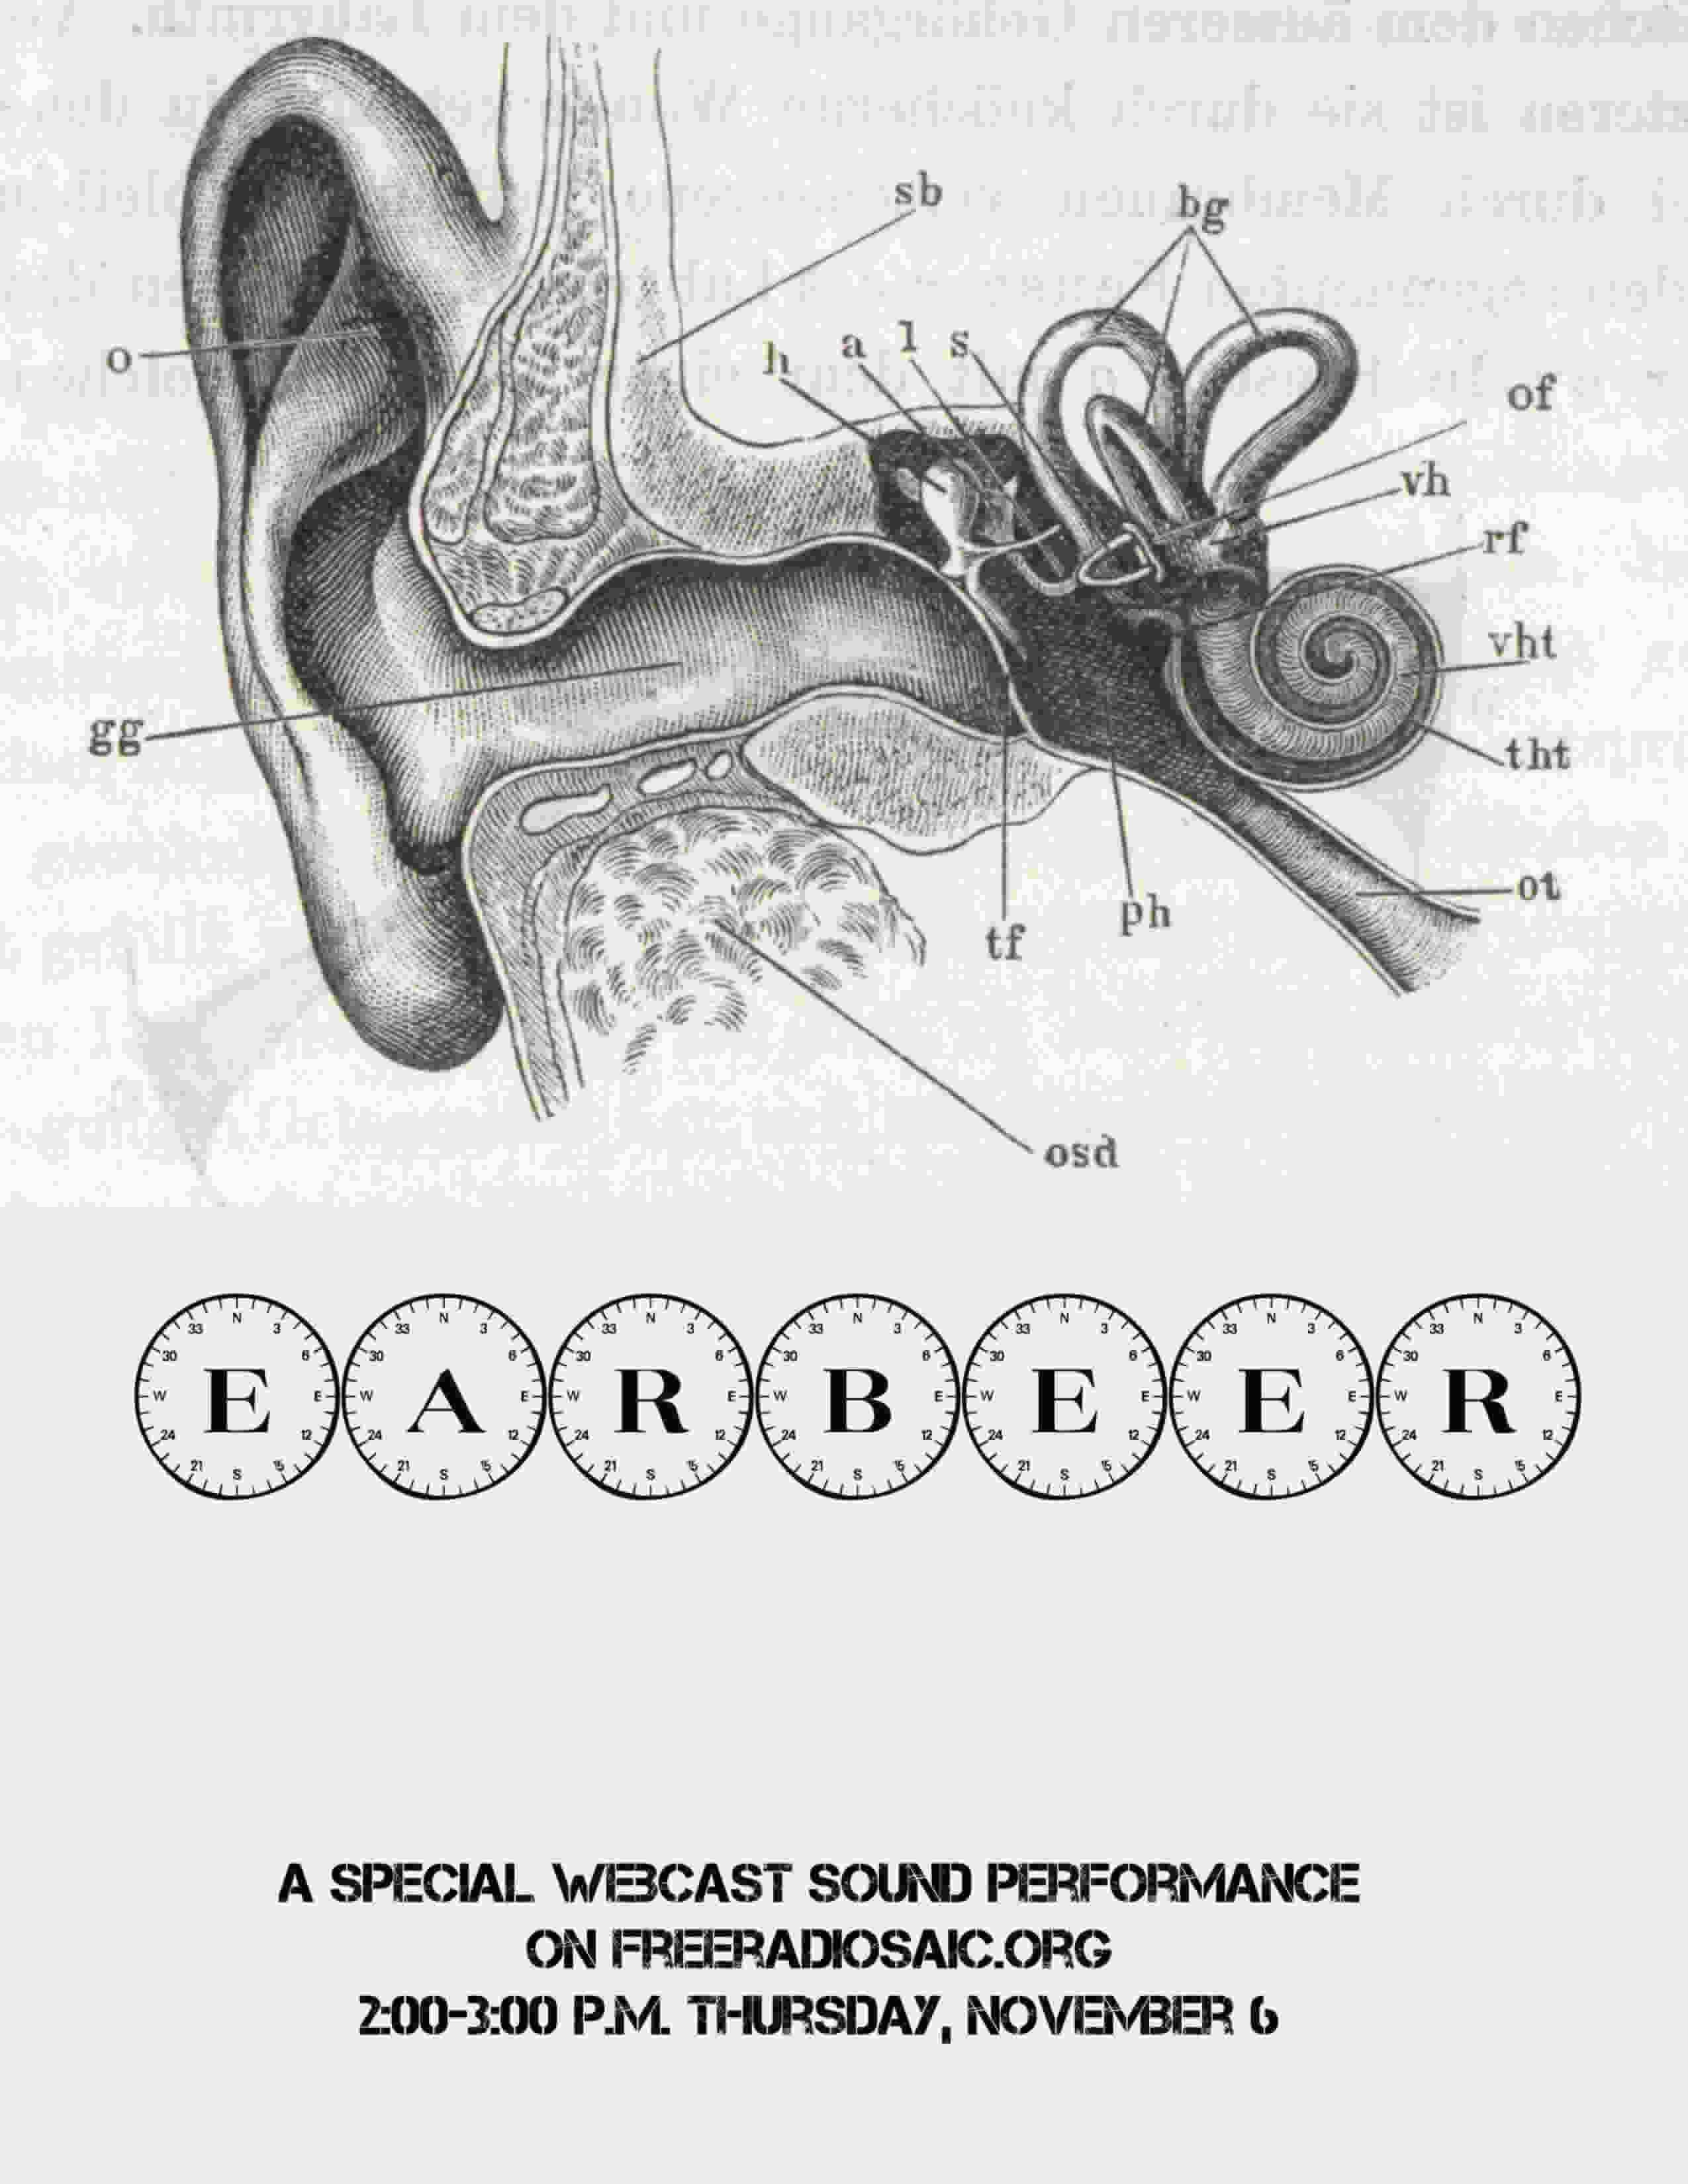 earbeer free radio saic flyer